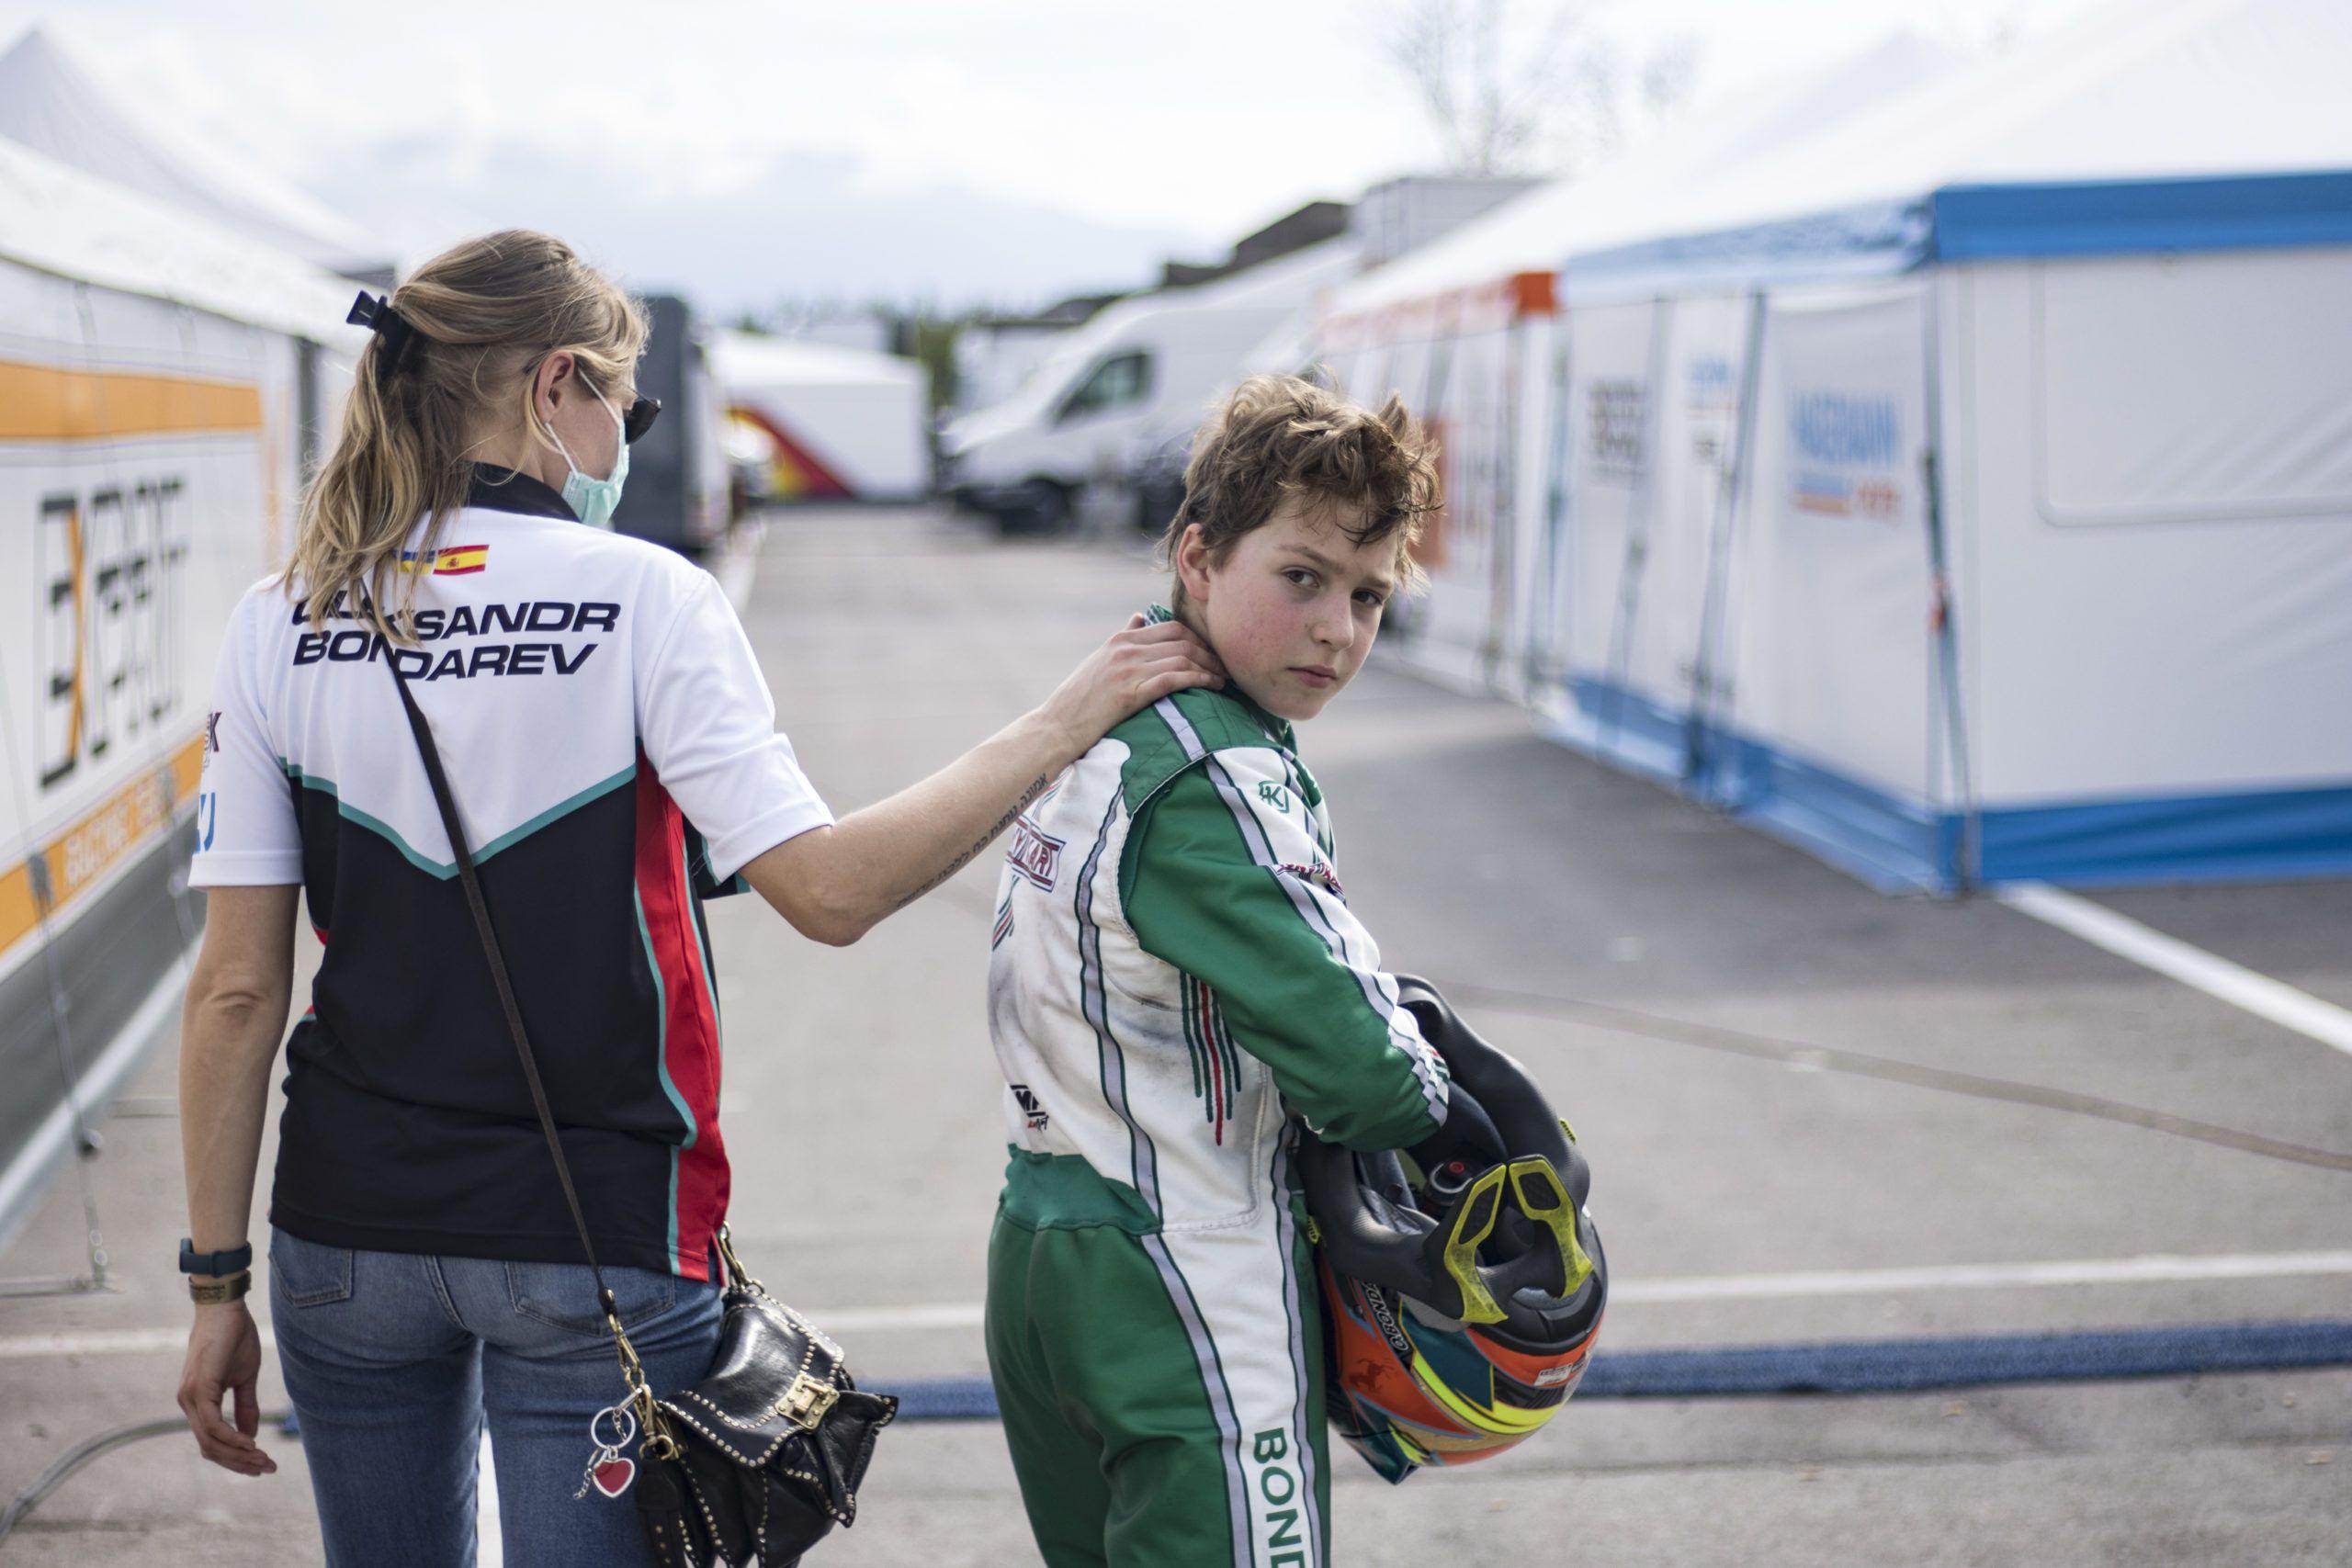 Oleksander Bondarev, OKJ, rotax max challenge, karting